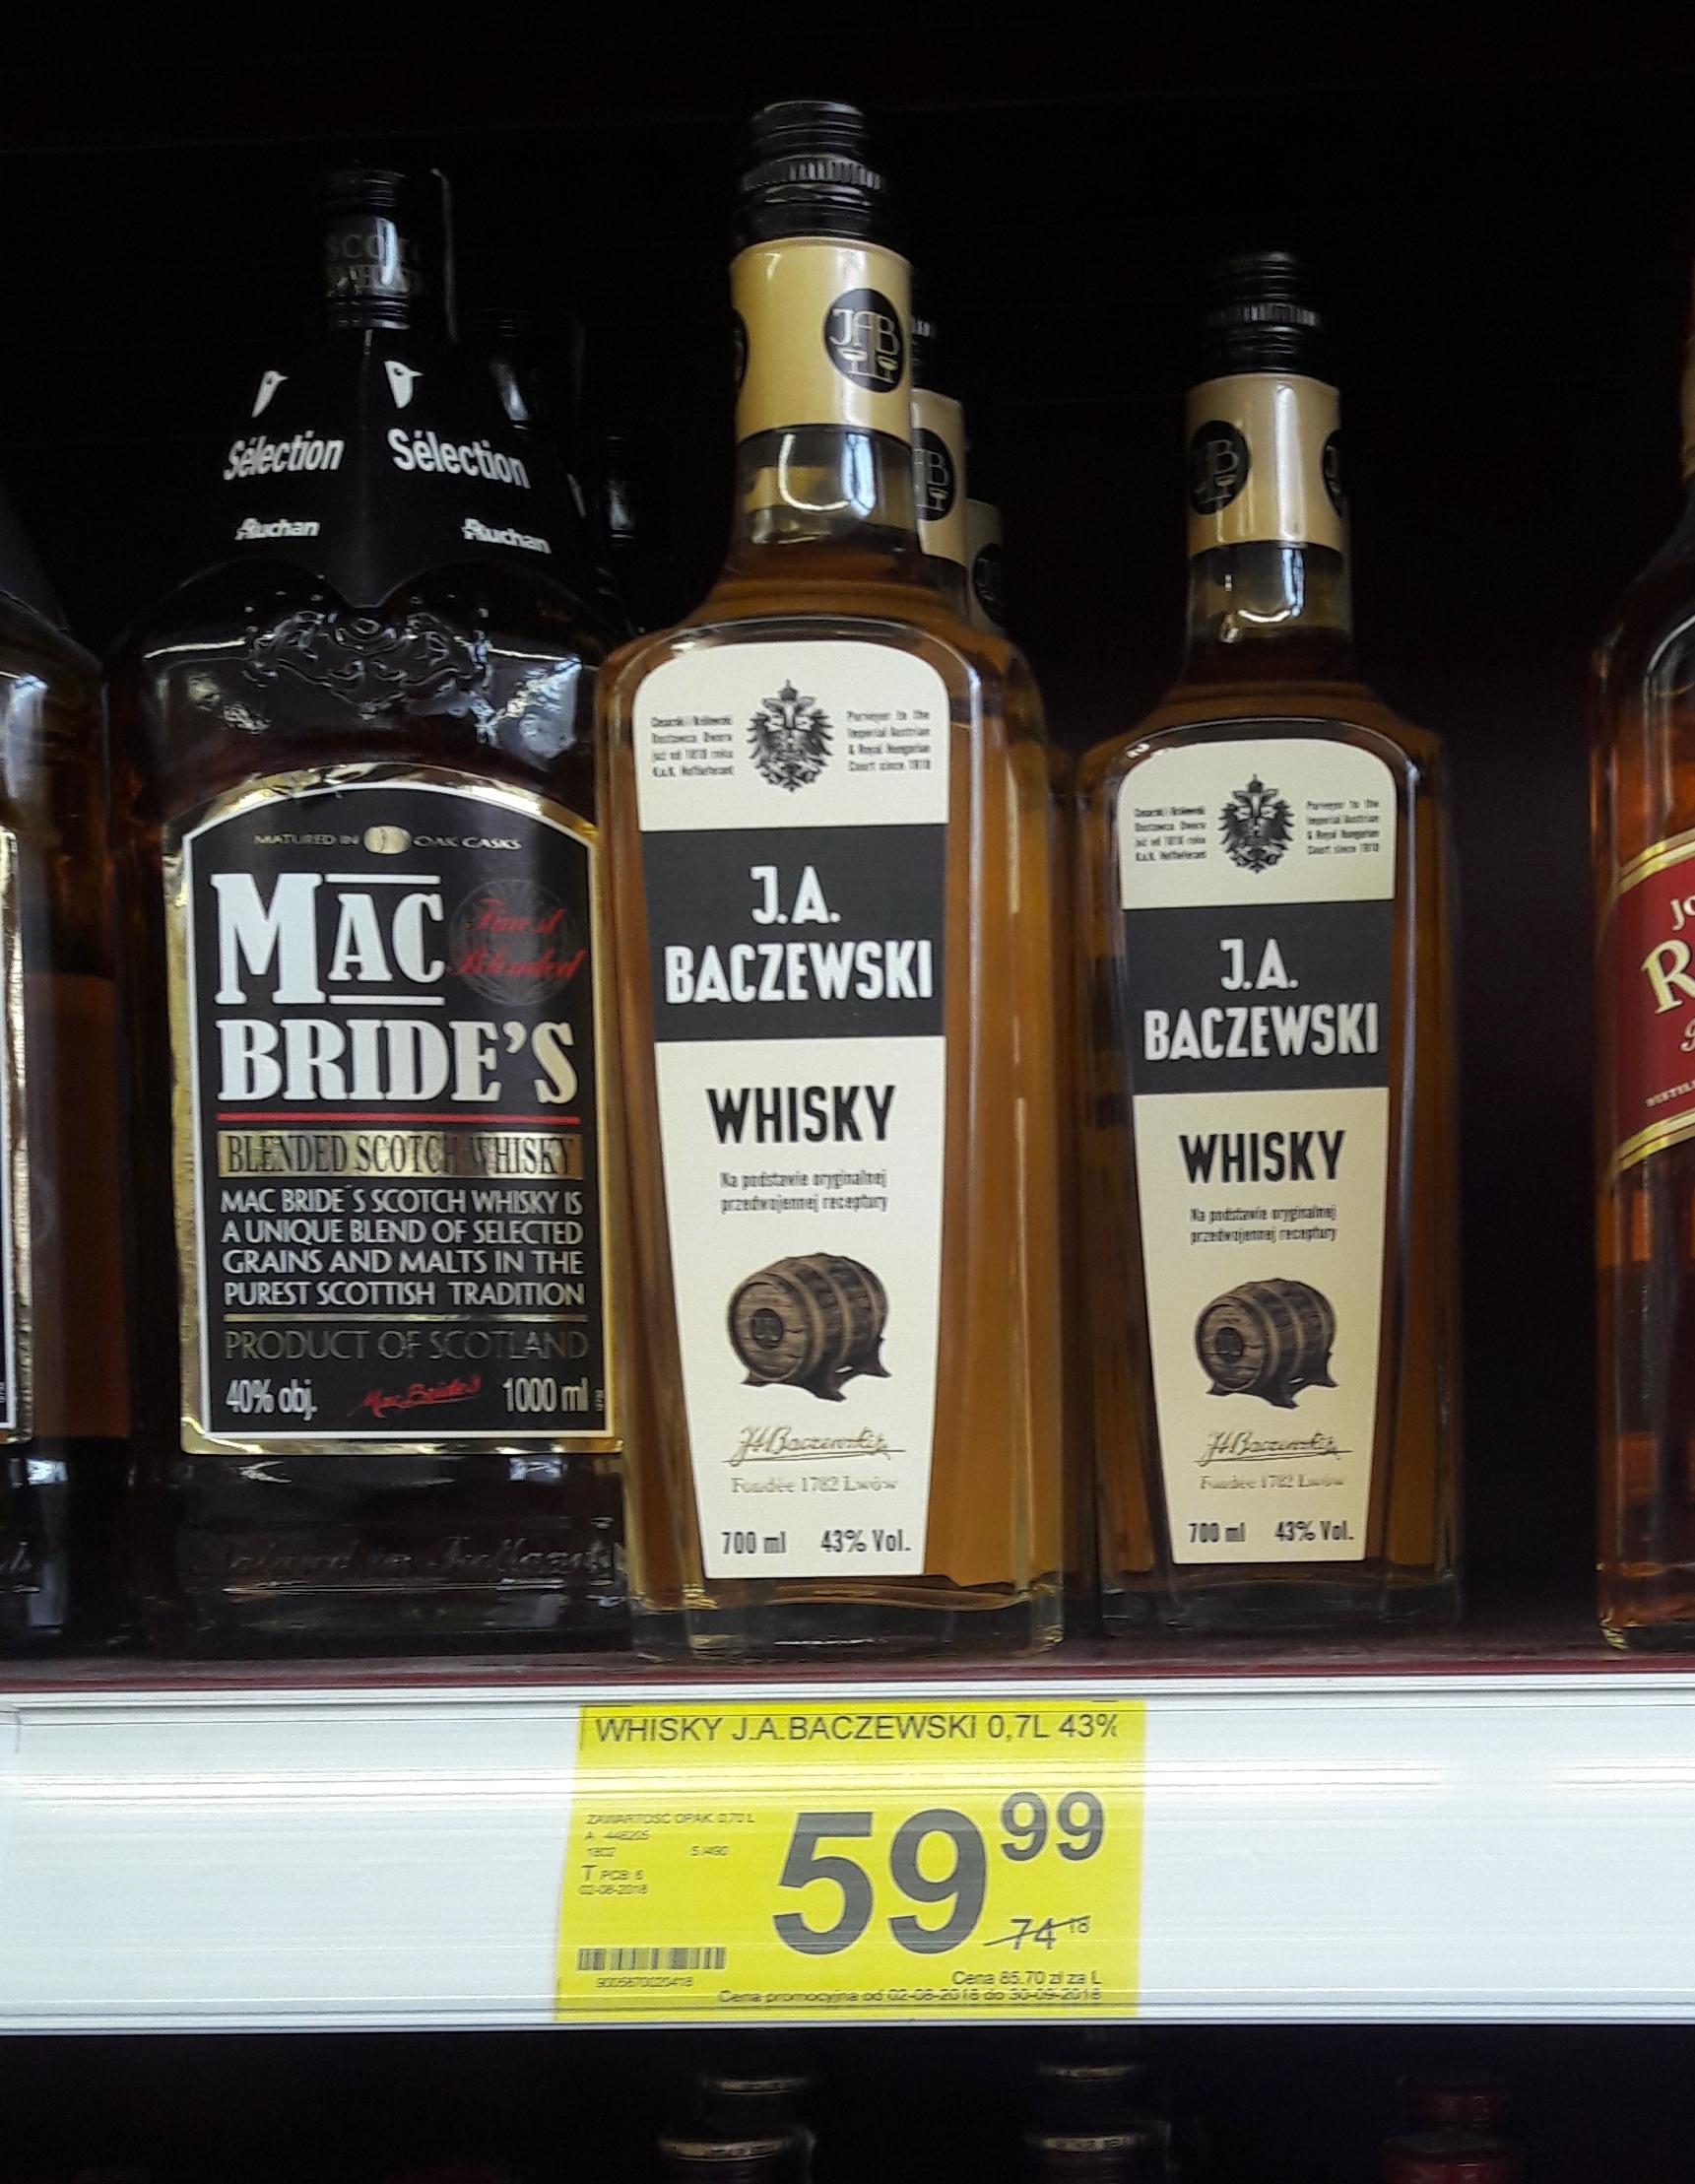 J.A. Baczewski Whisky 0.7l Simply Market